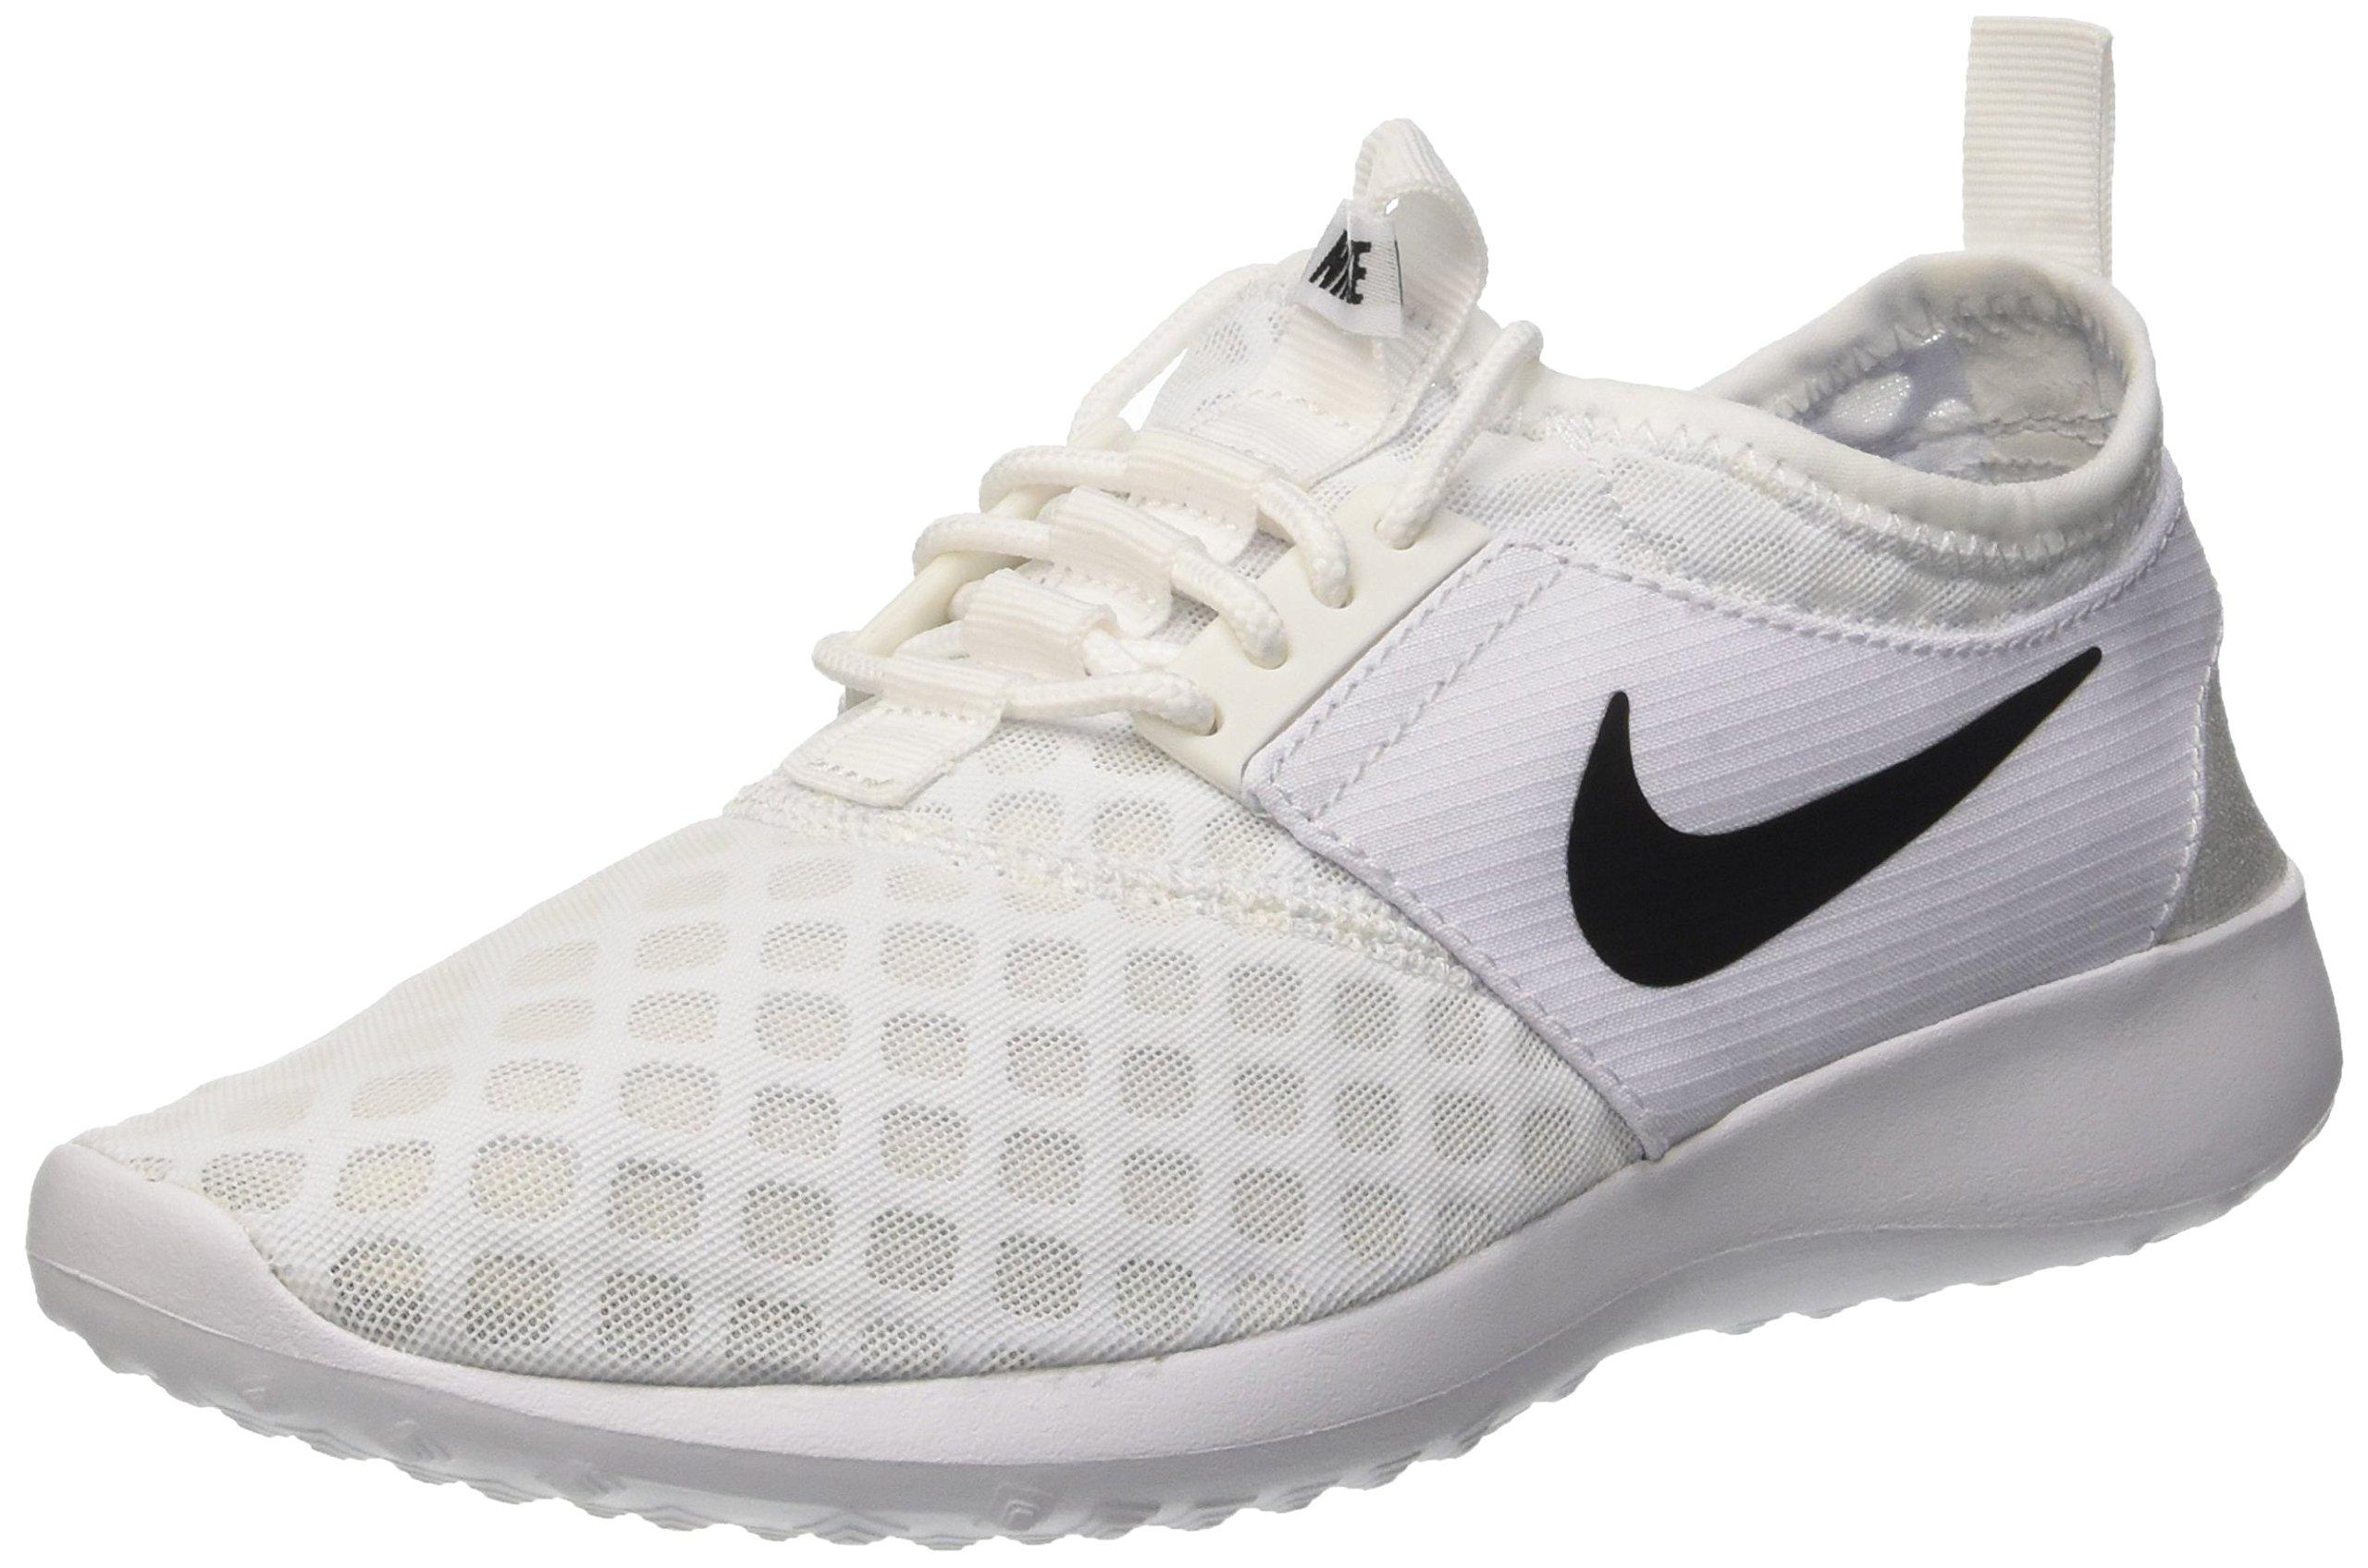 Nike Women's Juvenate Sneaker White/Black 6.5 B US